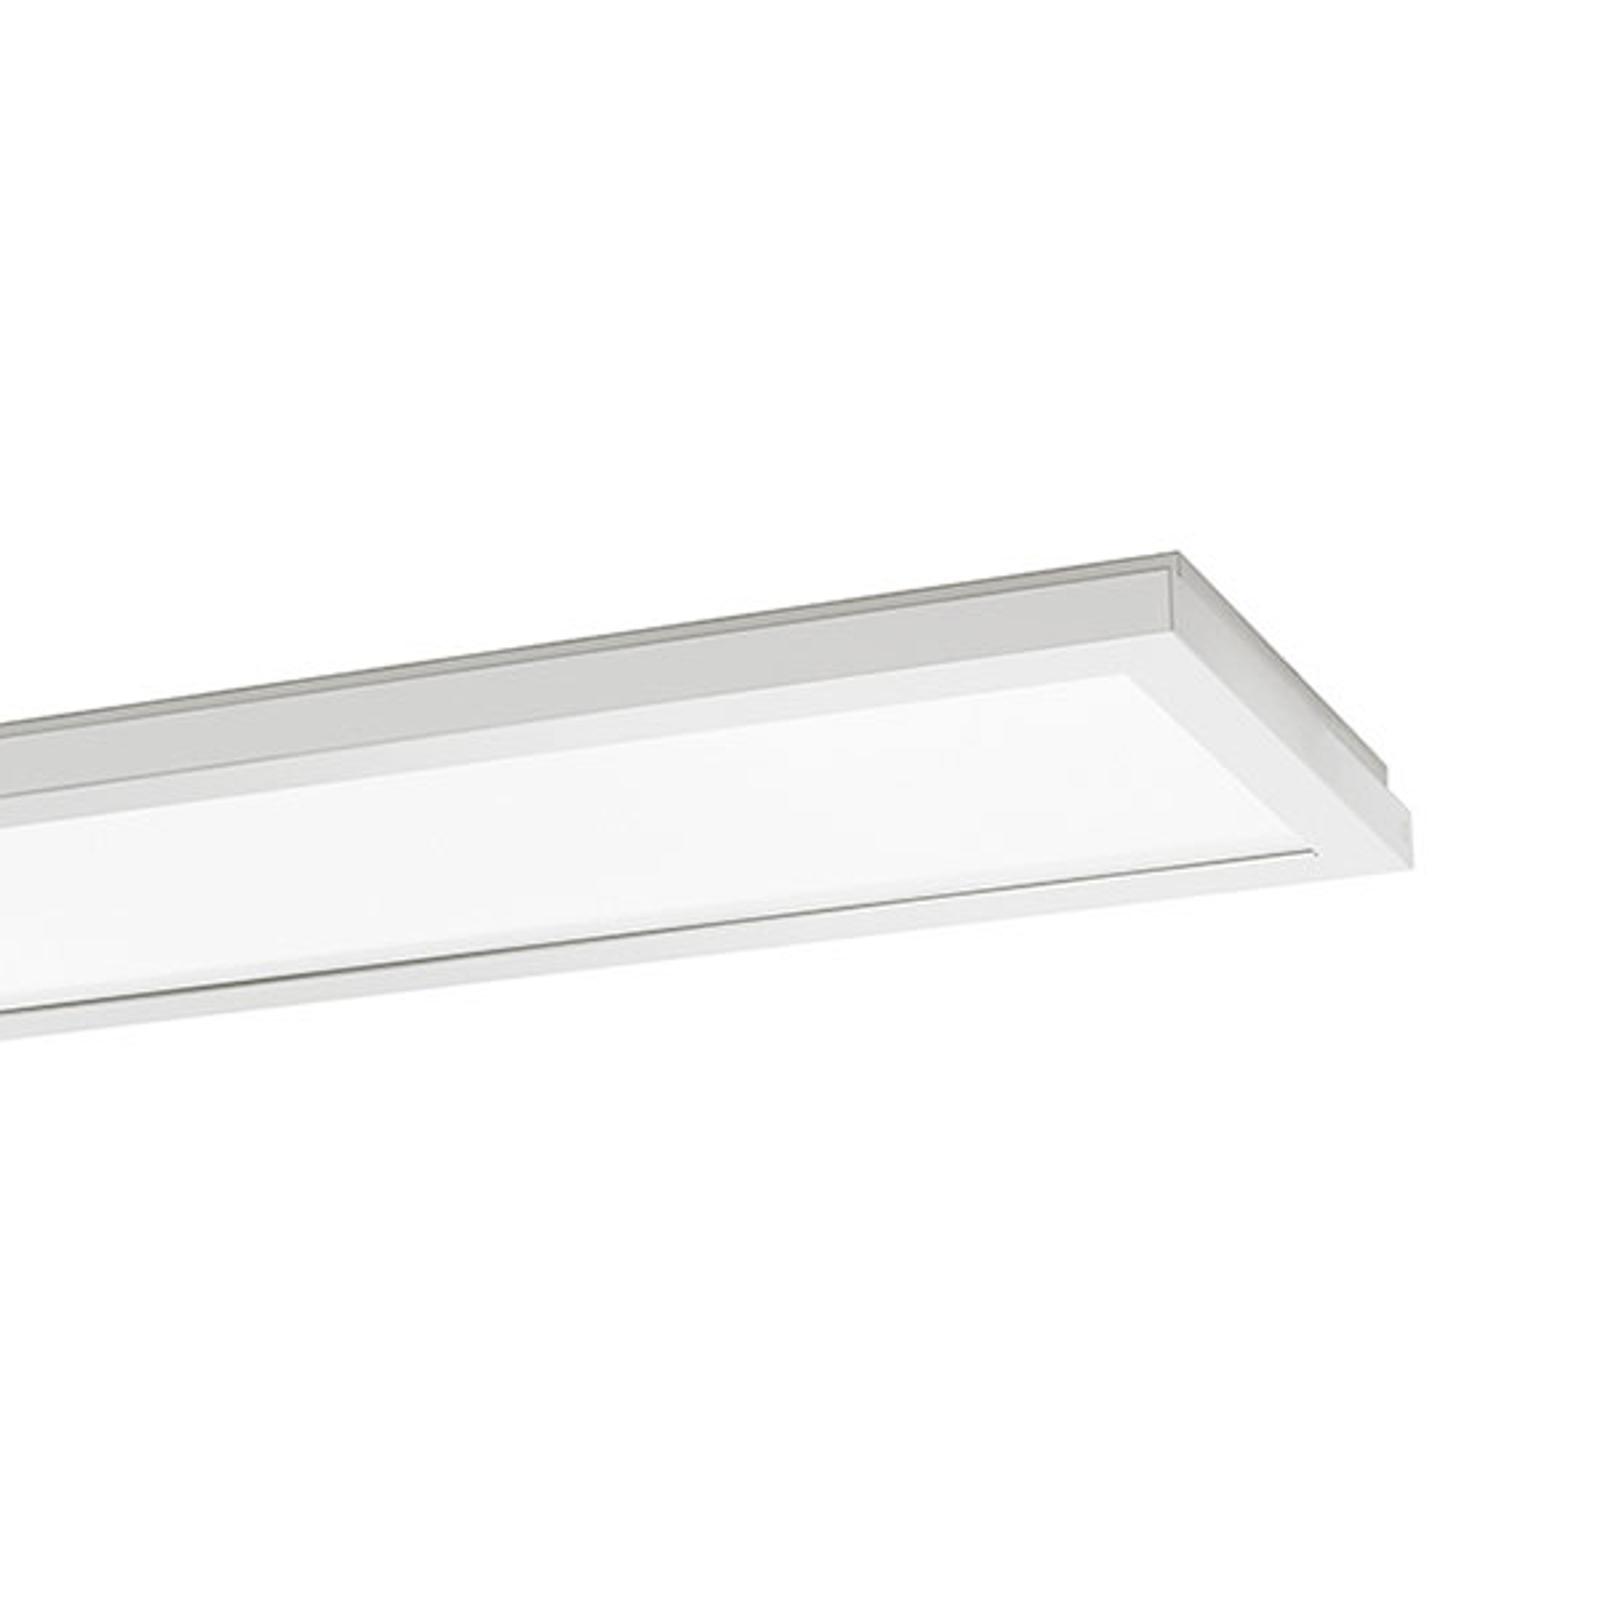 Lampa sufitowa SL630AB DALI+Touch 157cm biała